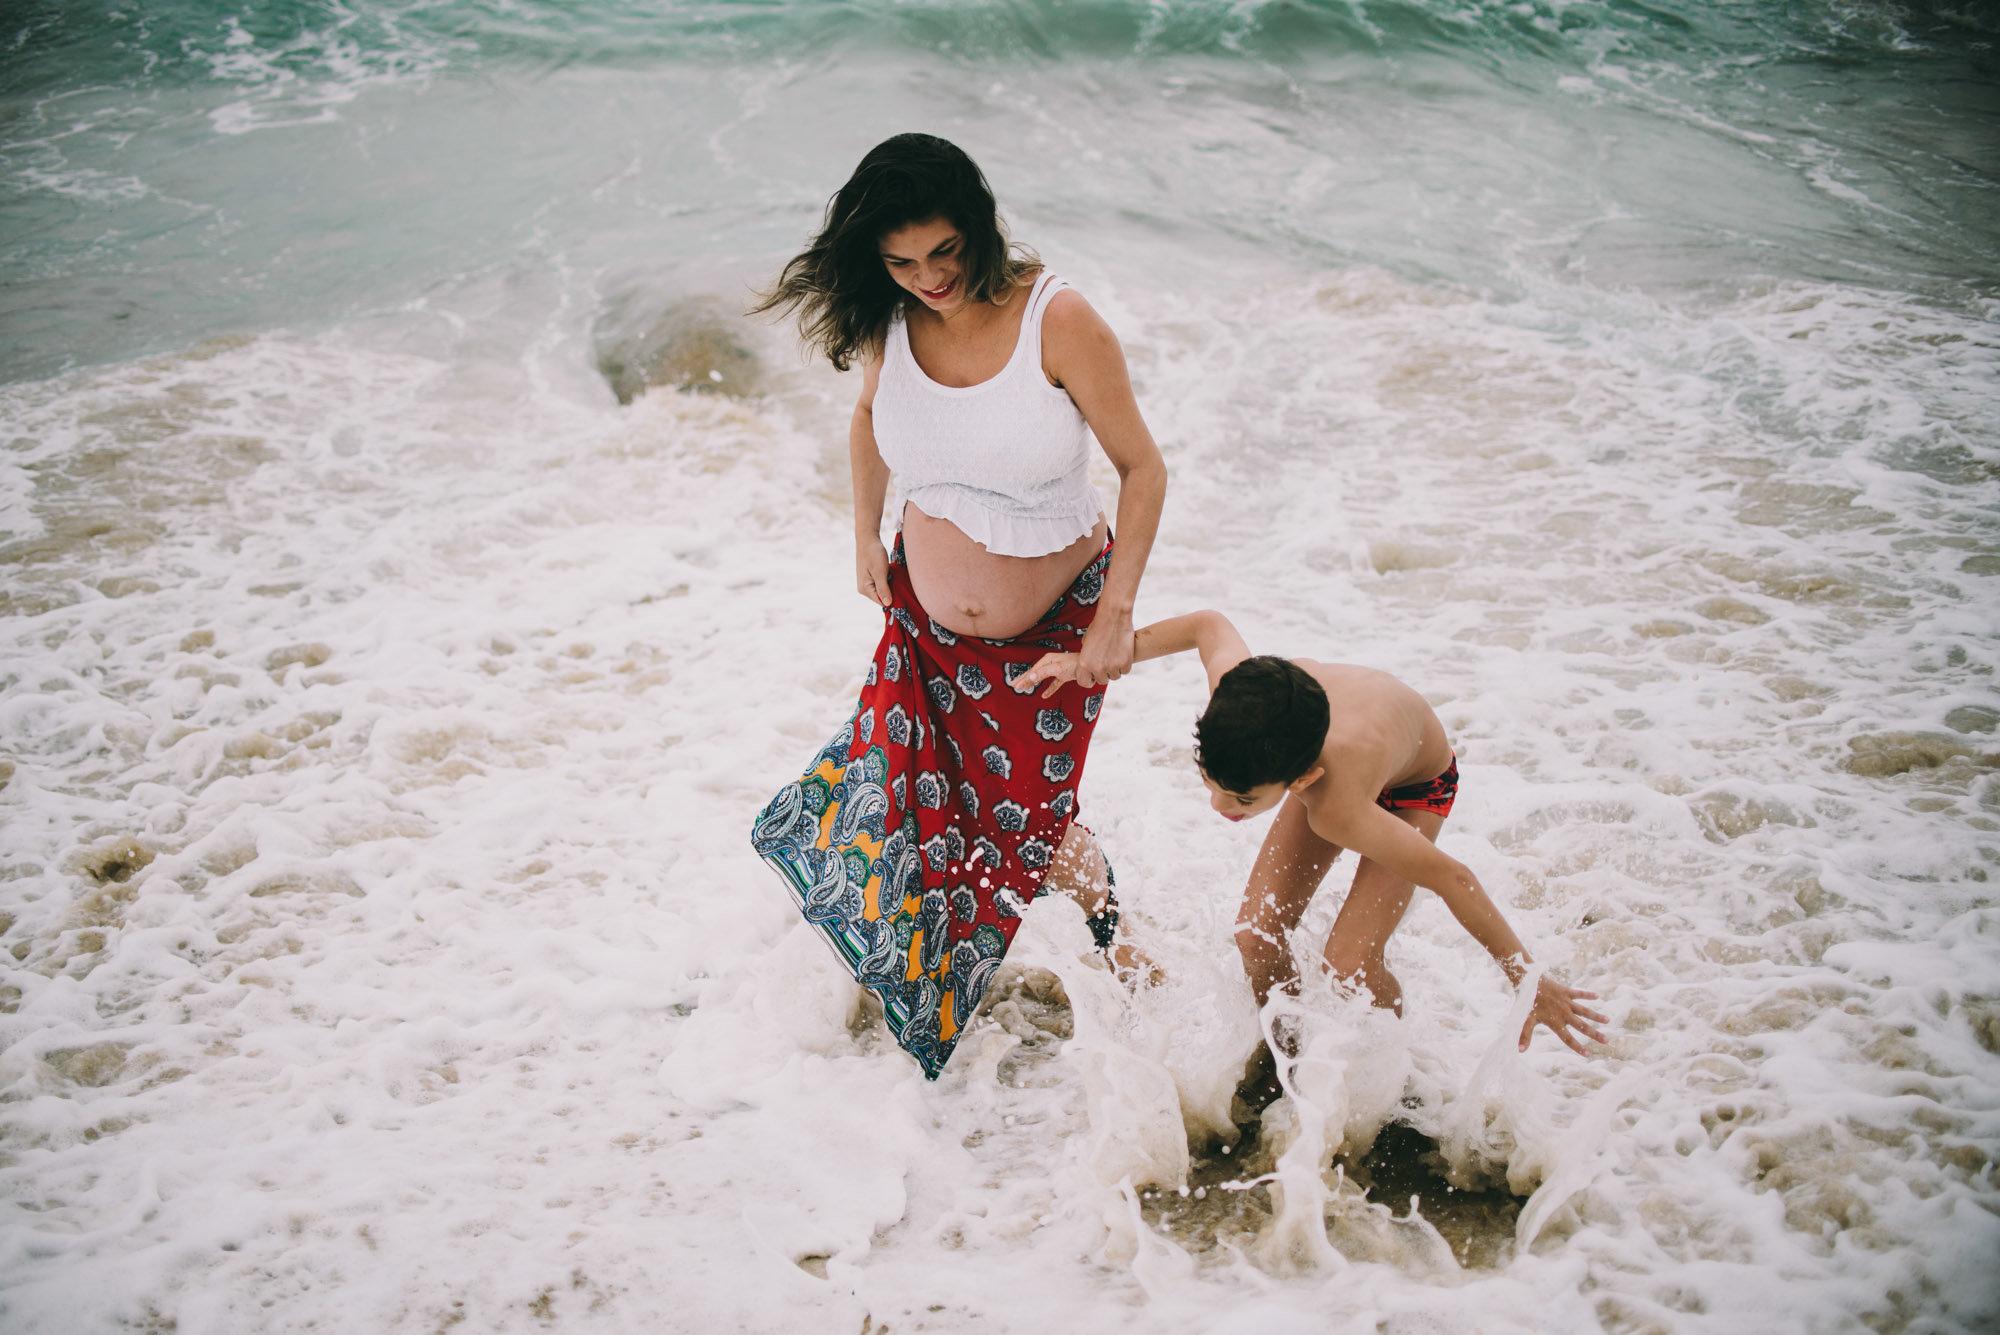 diversão na praia